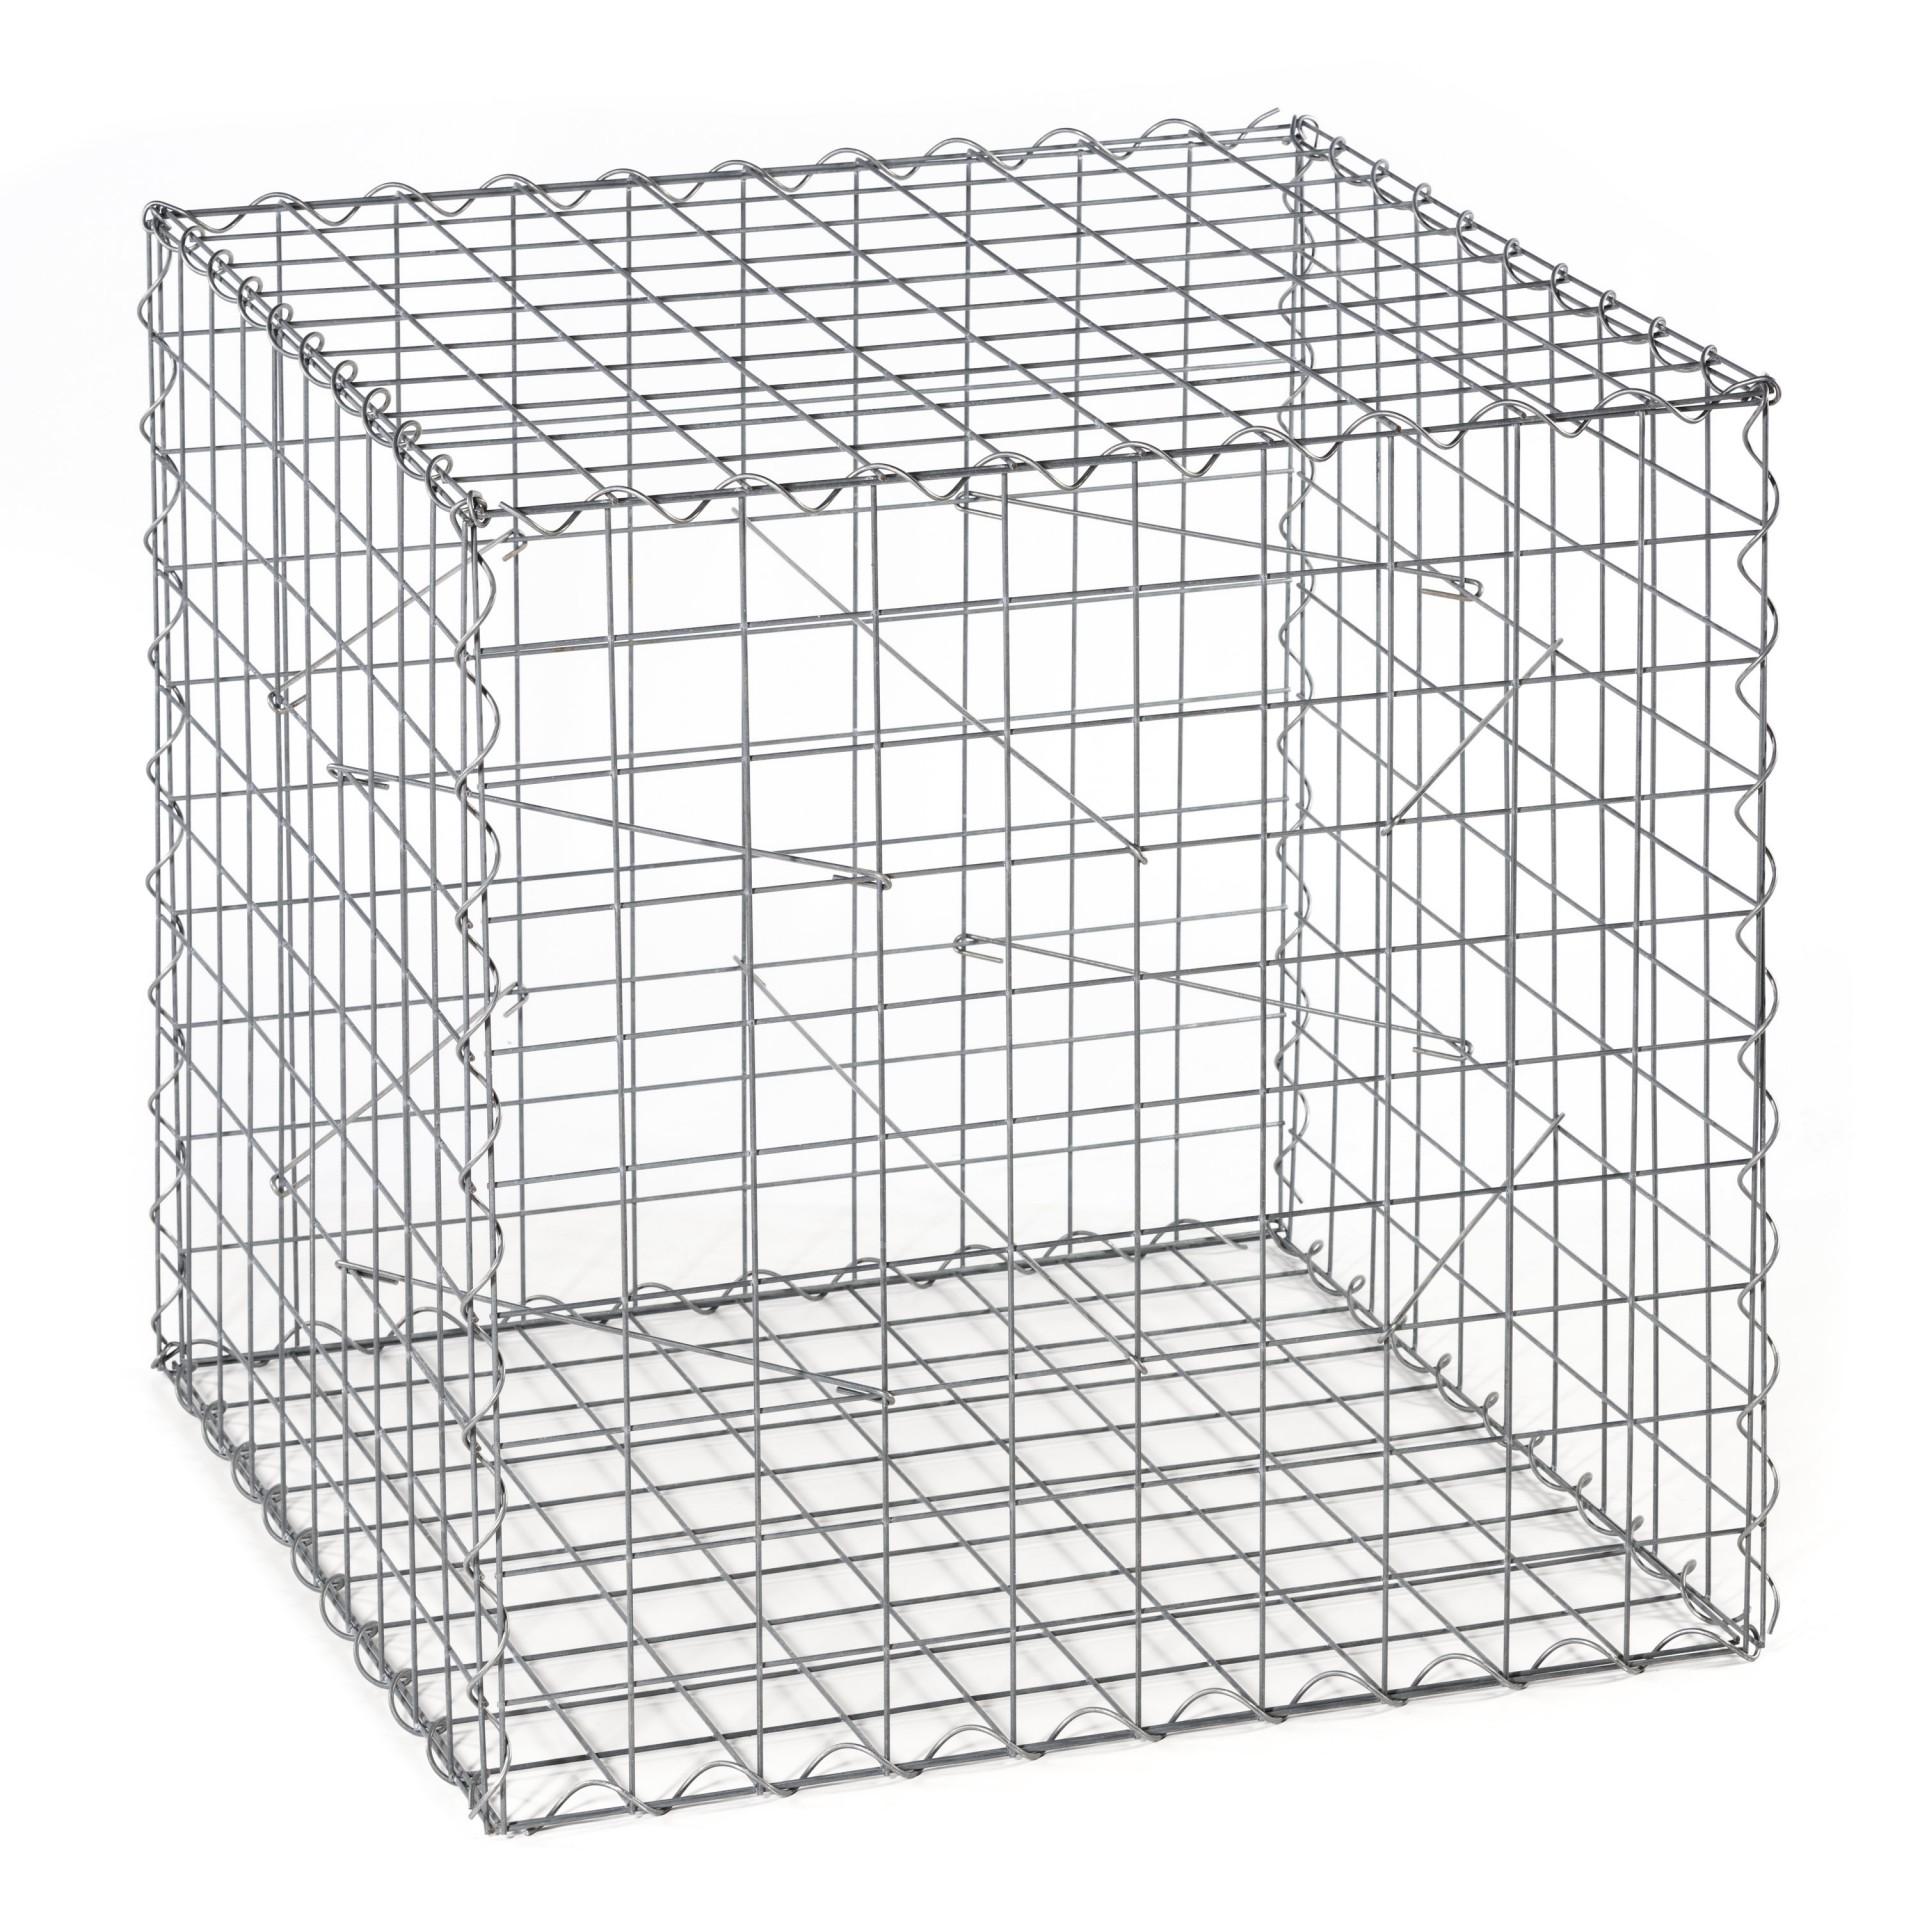 gabionengrundkorb typ a korb a 1000 x 1000 x 1000 mm mw. Black Bedroom Furniture Sets. Home Design Ideas